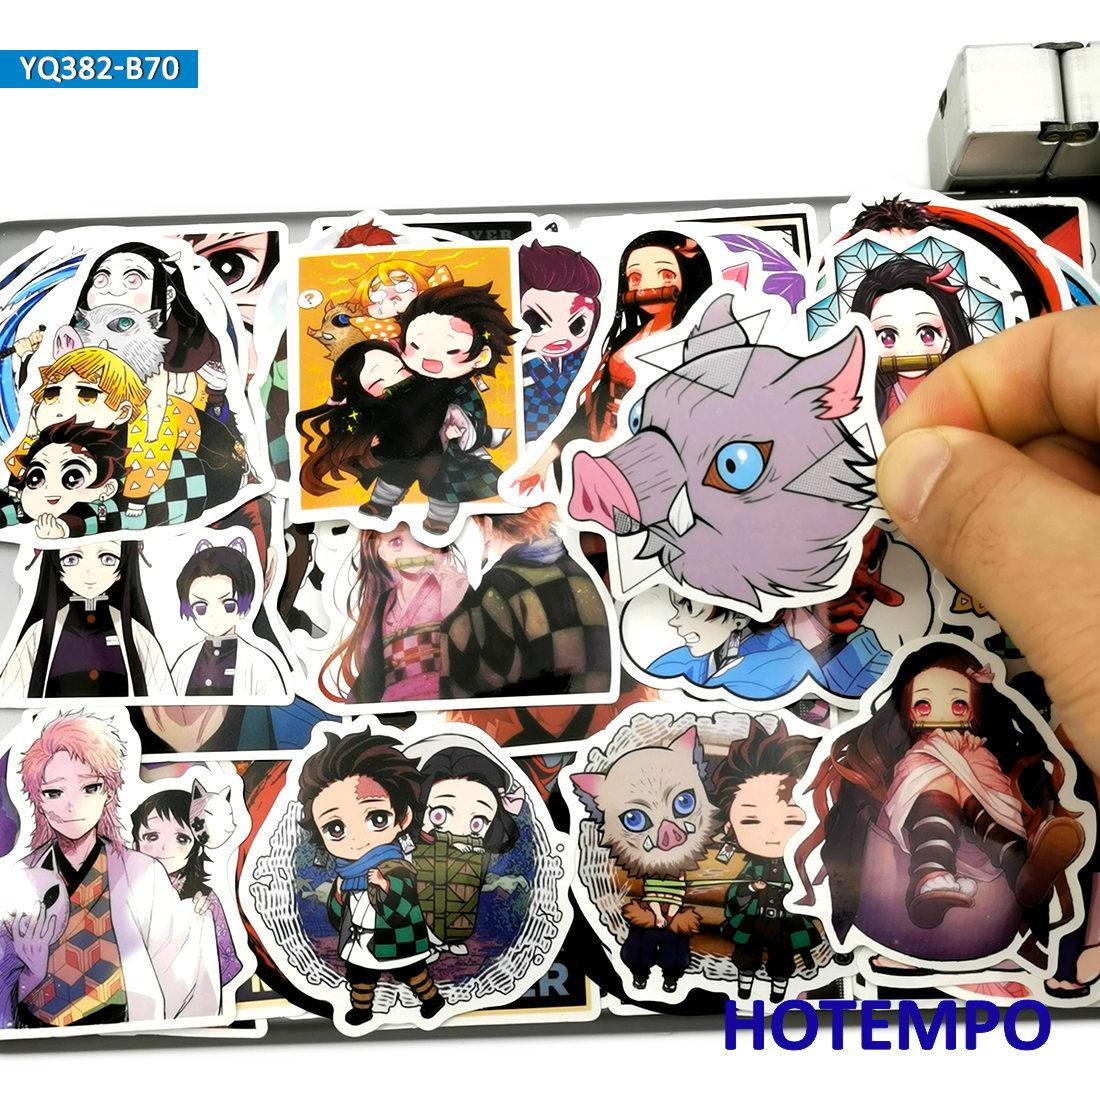 70pcs Japan Anime Demon Slayer Kimetsu No Yaiba Stickers Toys For Mobile Phone Laptop Suitcase Skateboard Cartoon Decal Stickers